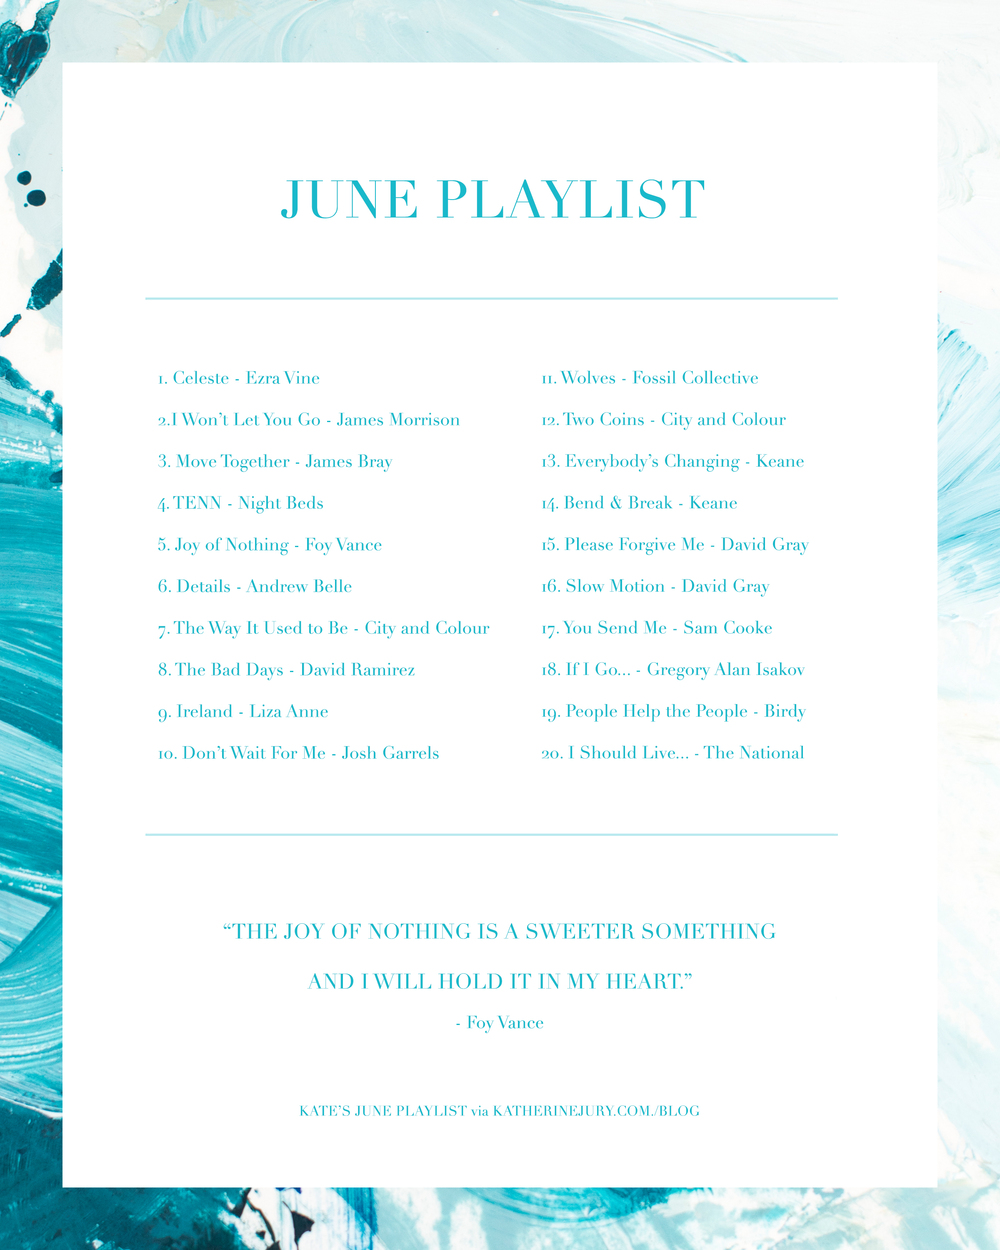 June Playlist copy.jpg